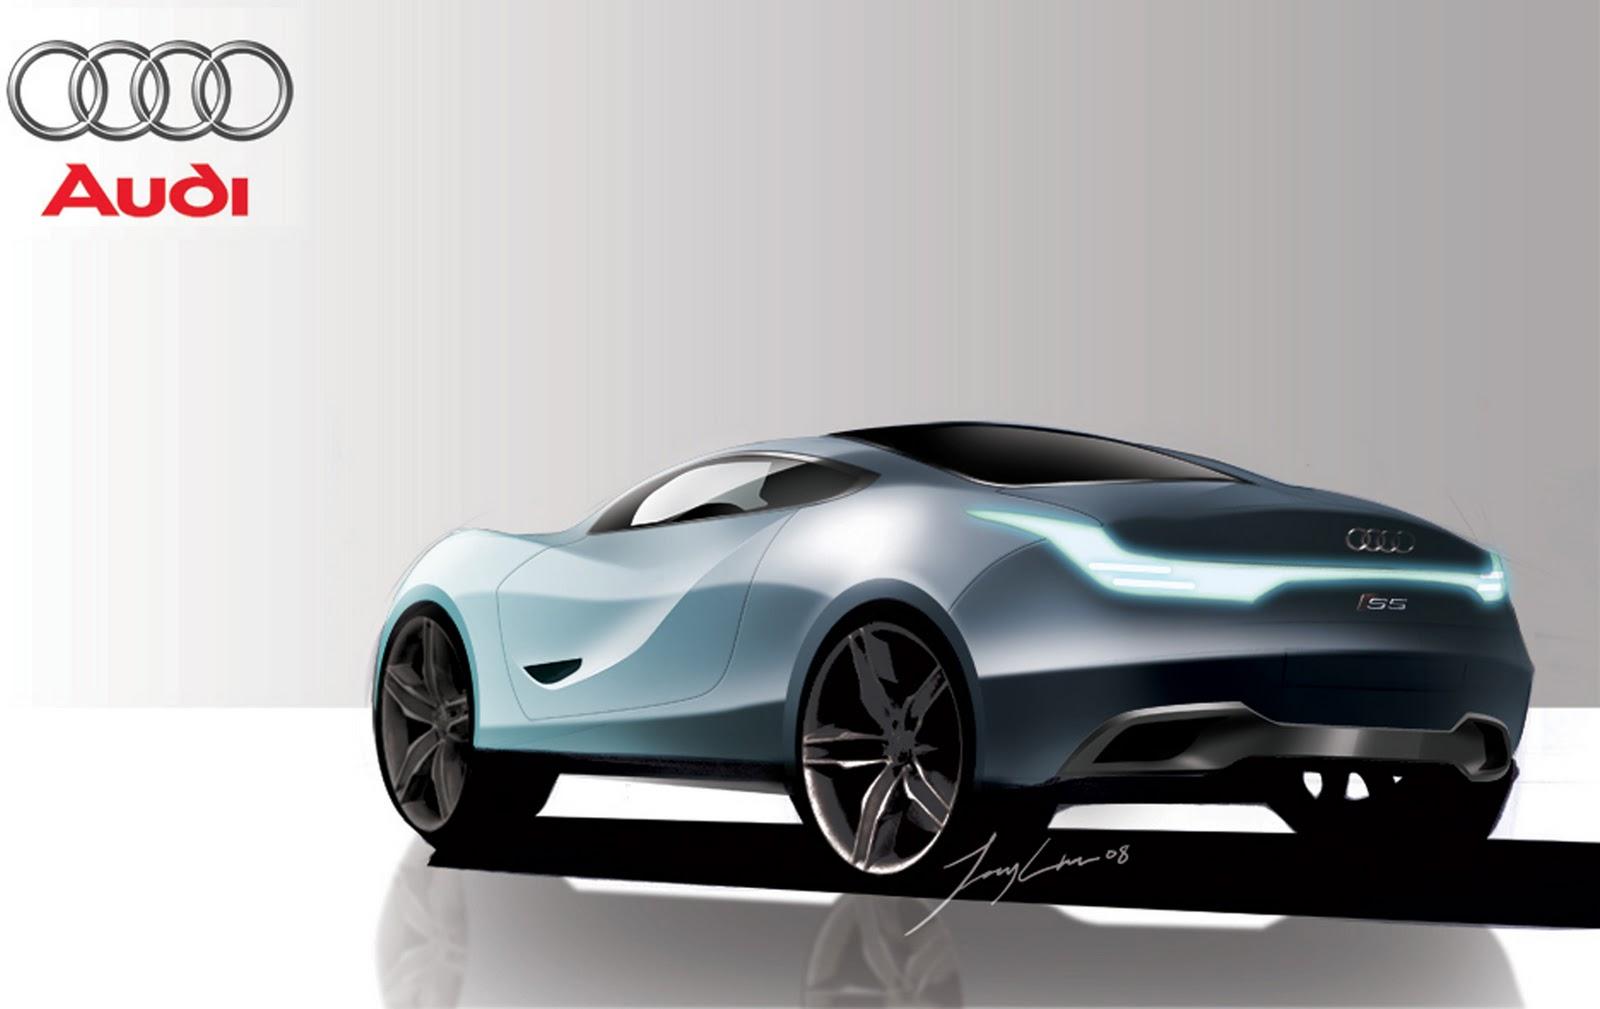 futuristic audi sport car concept